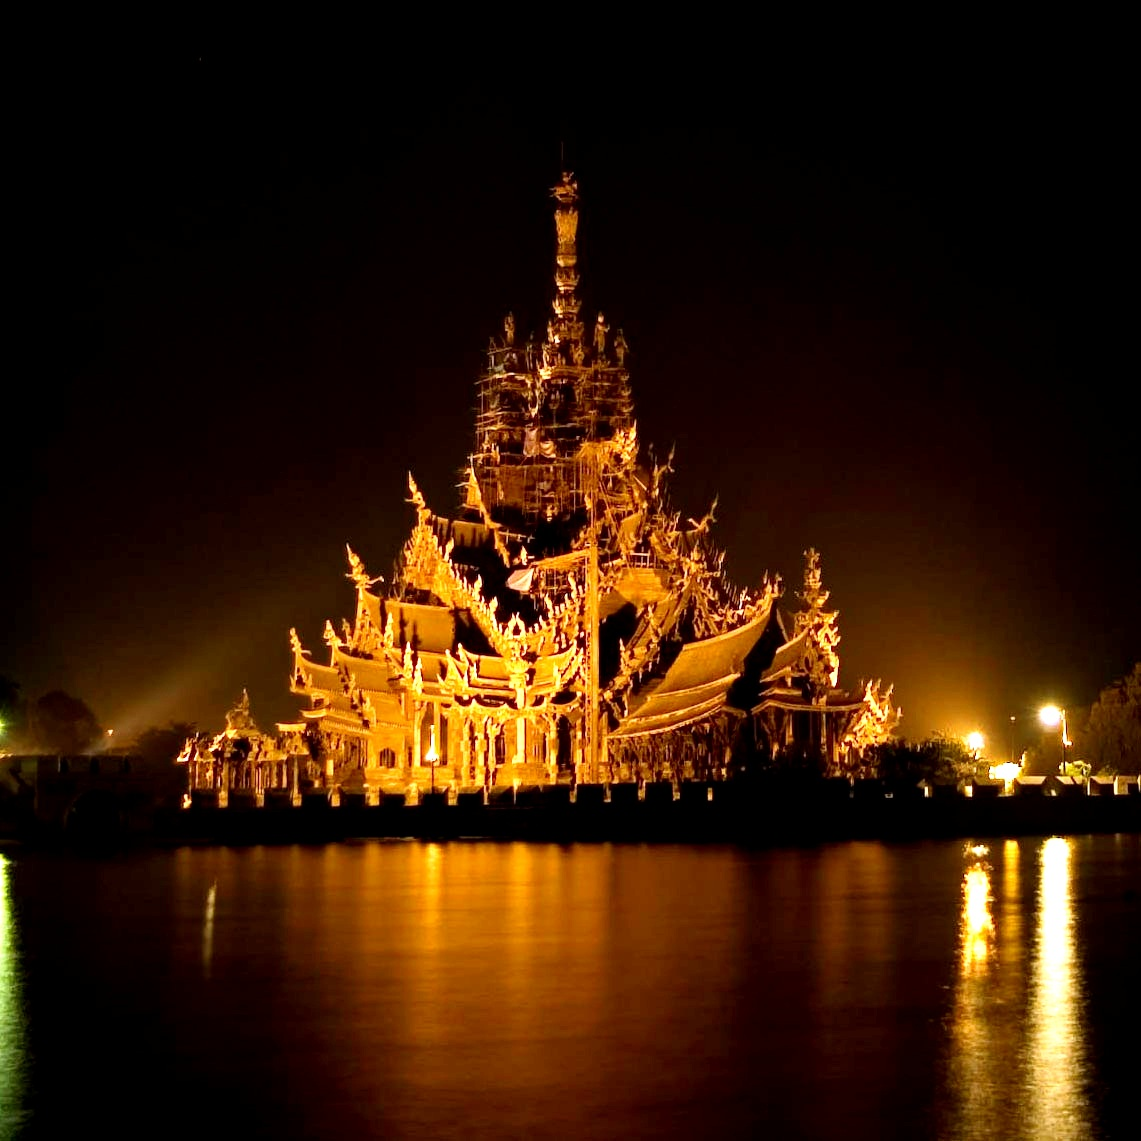 храм истины ночью